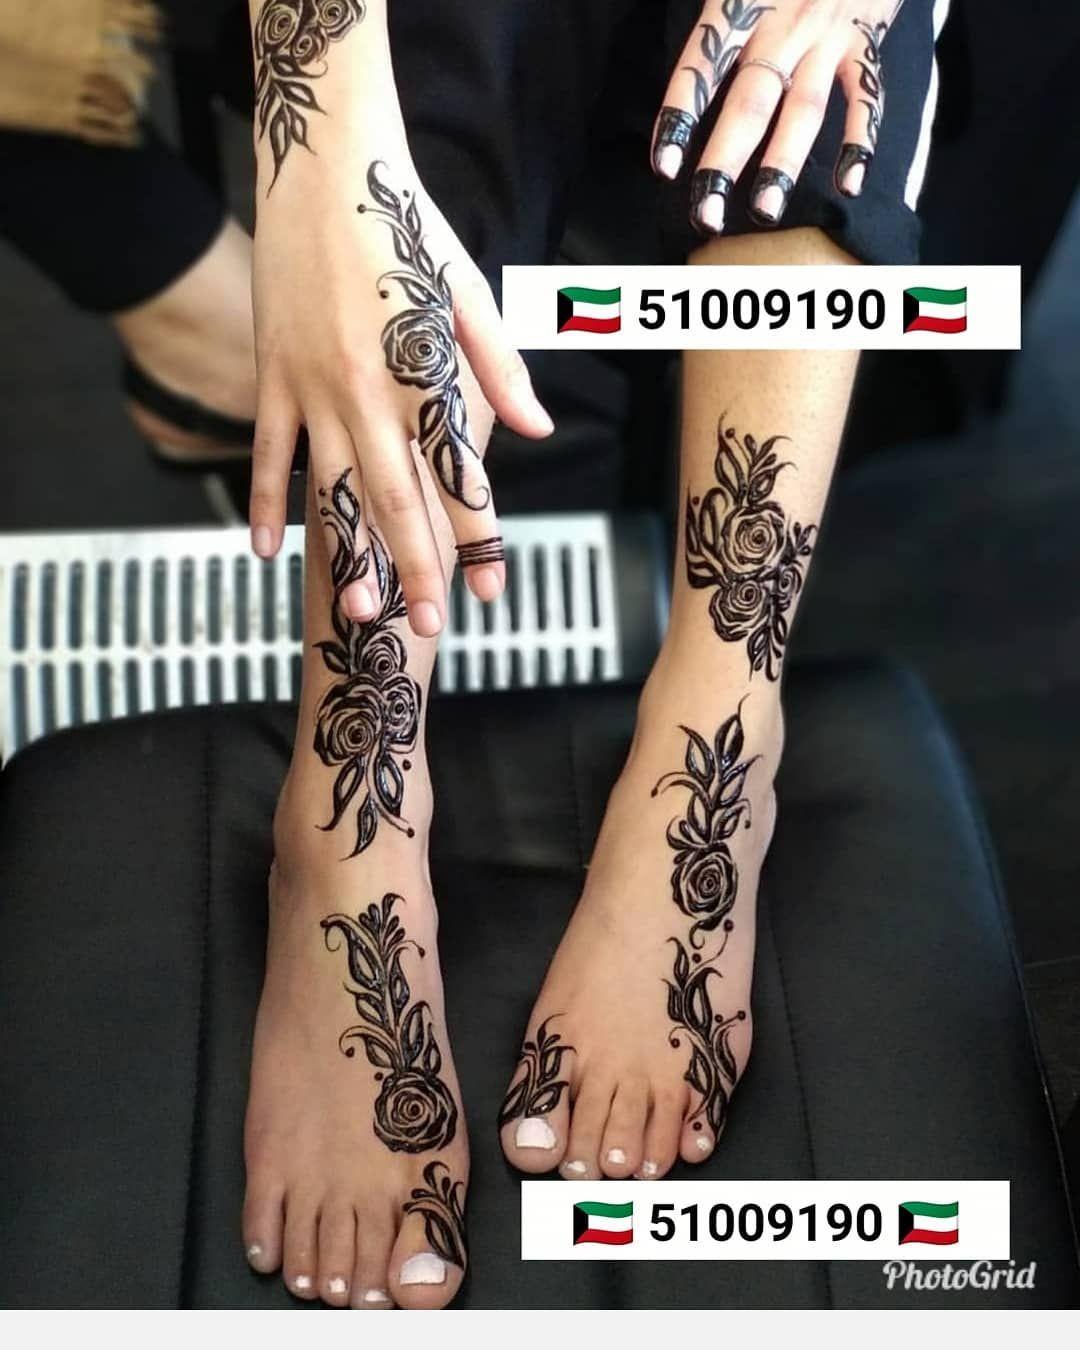 نقش الحناء الكويت شهر رمضان Henna Is My Passion Call Me Or Whatsapp 965 51009190 Call 965 51009190 خدمه منازل اتصال وات ساب هذا Kuwait Heena Artist ا